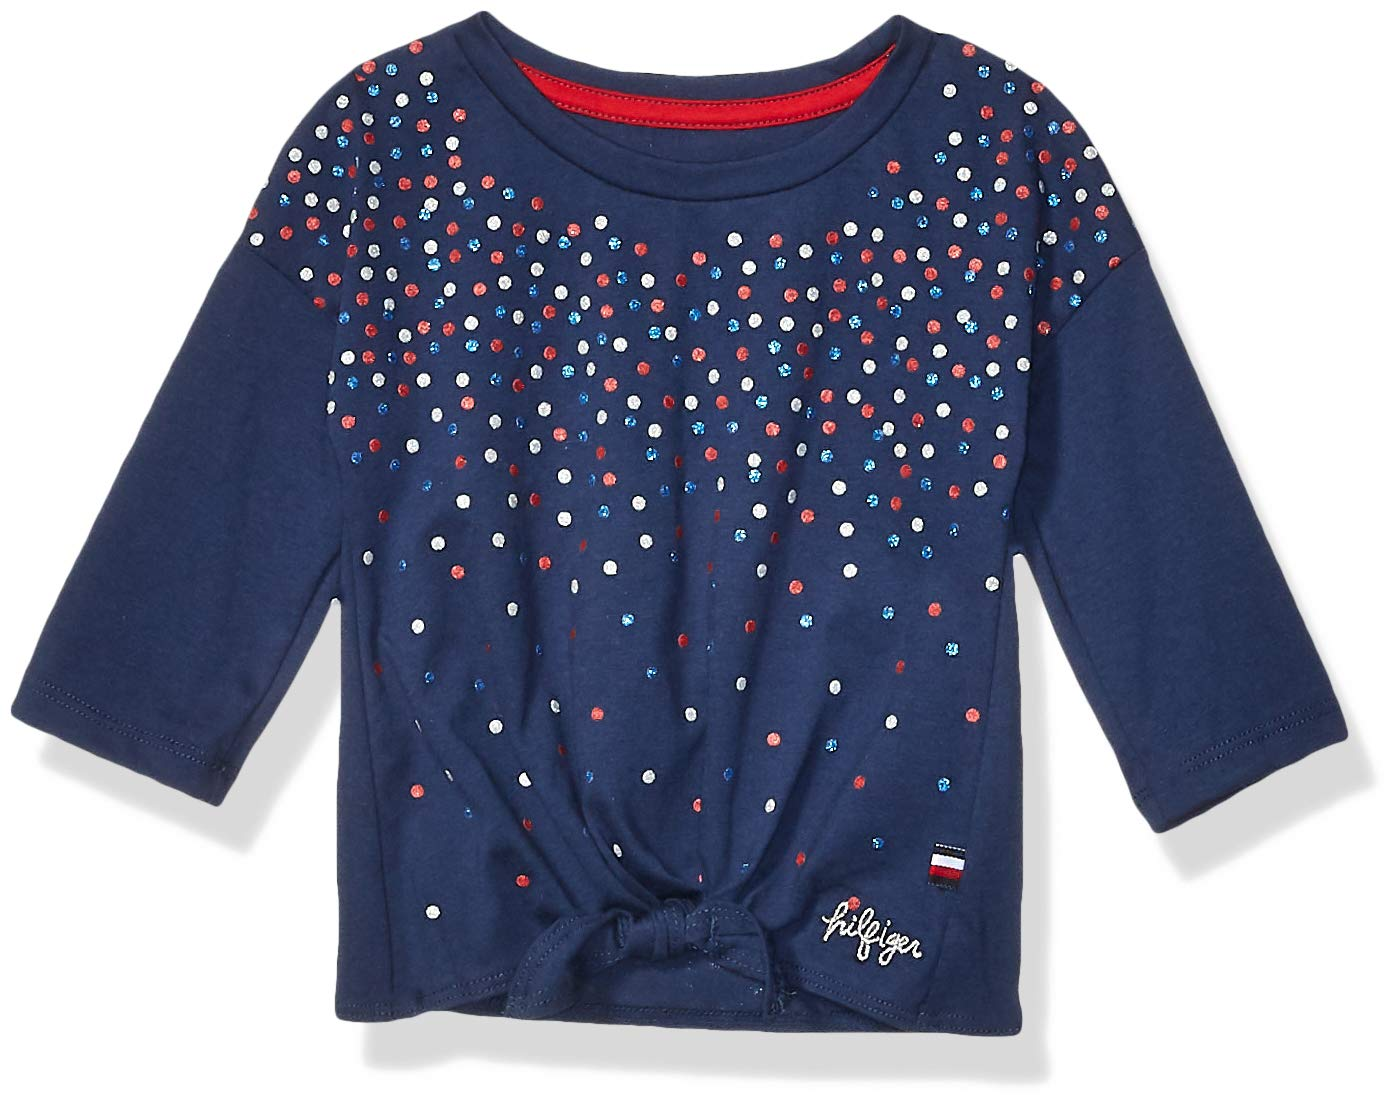 Tommy Hilfiger Girls' Core Crew Neck Tee Shirt